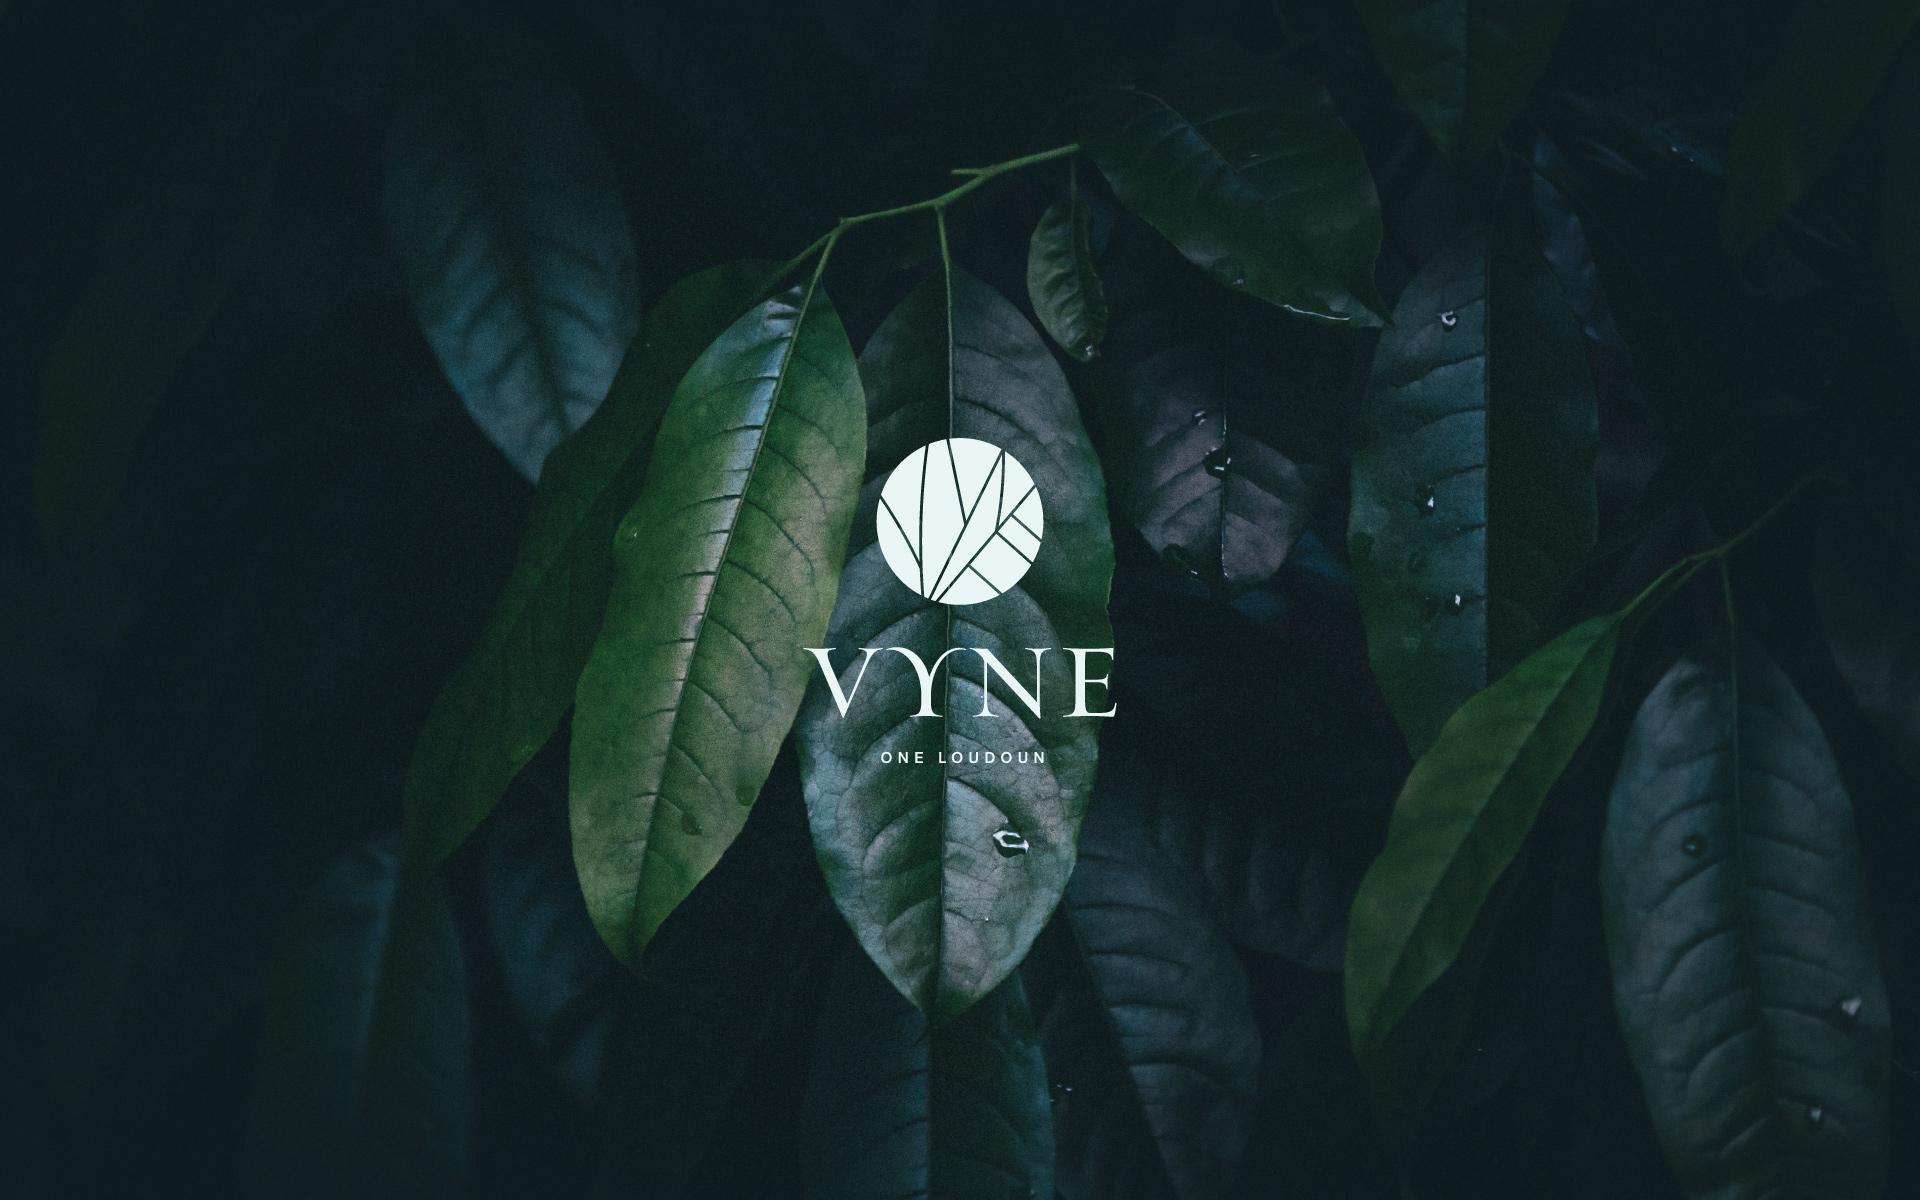 Vyne One Loudoun logo